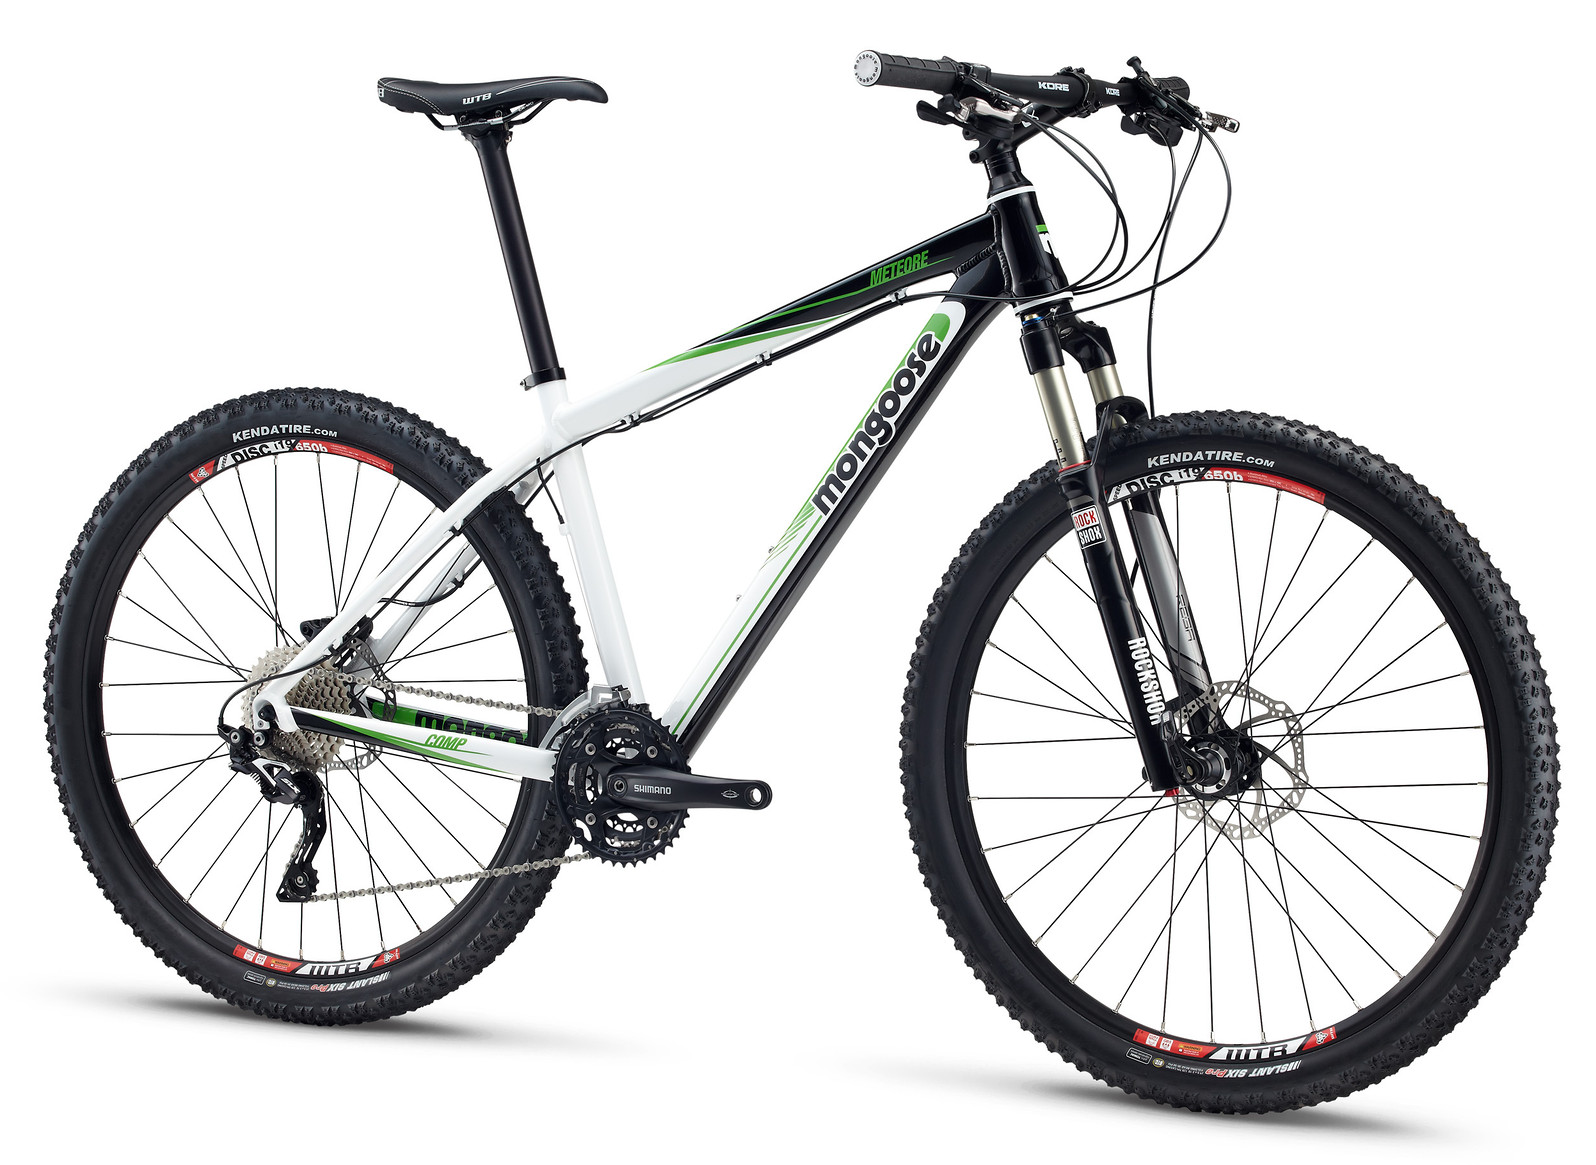 2014 Mongoose Meteore Comp Bike